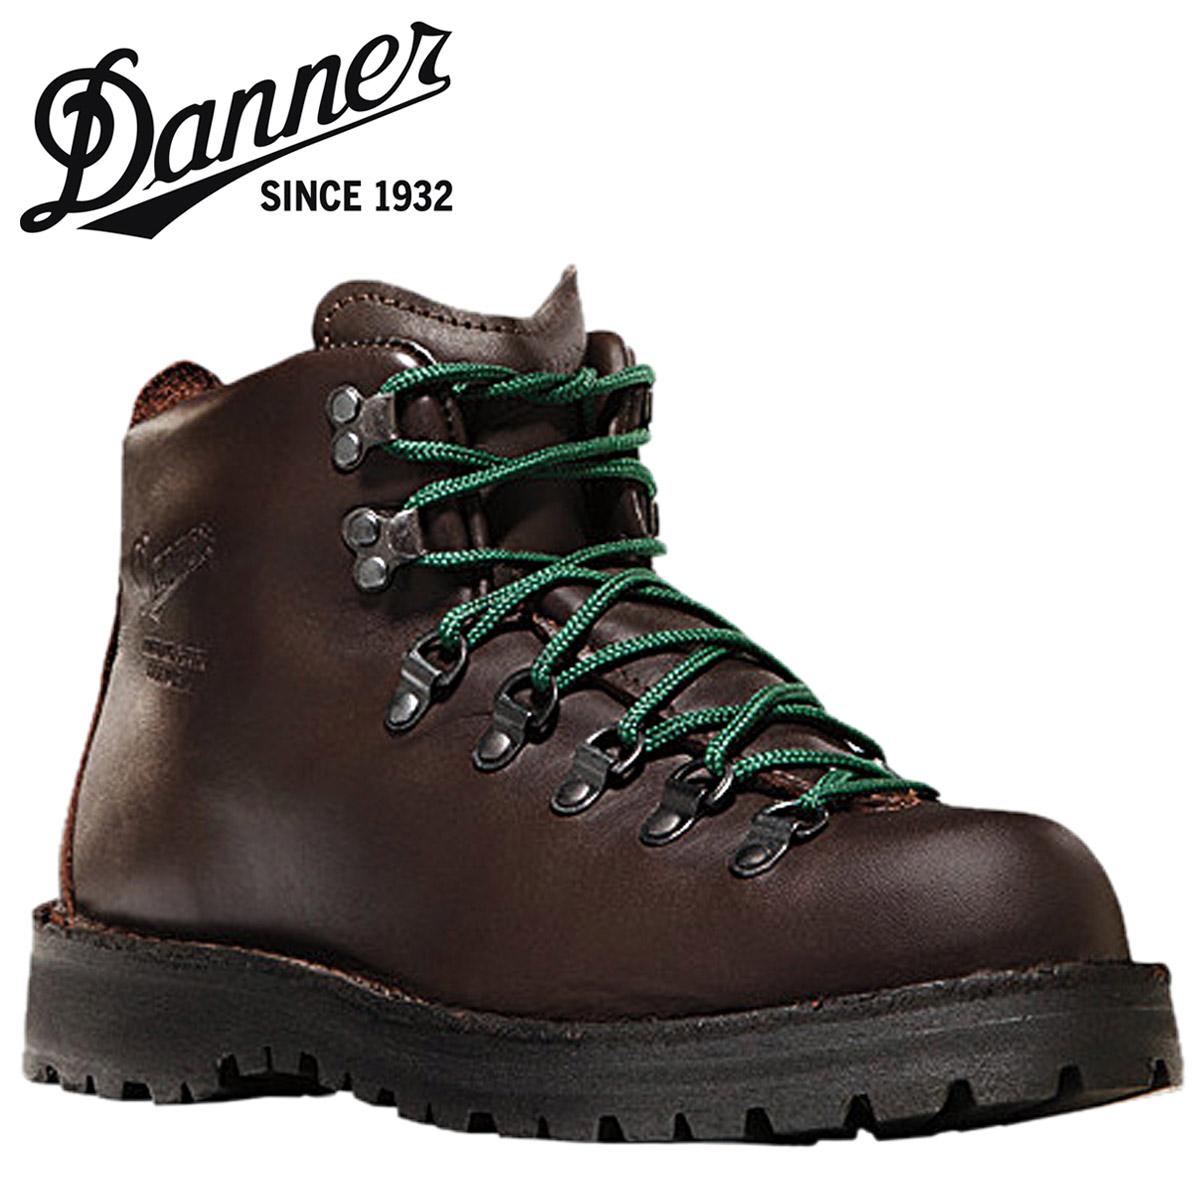 Danner ダナー マウンテンライト2 30800 ダークブラウン Mountain Light II Dワイズ EEワイズ レザー GORE-TEX ブーツ BOOTS Made in USA メンズ [3/3 再入荷]